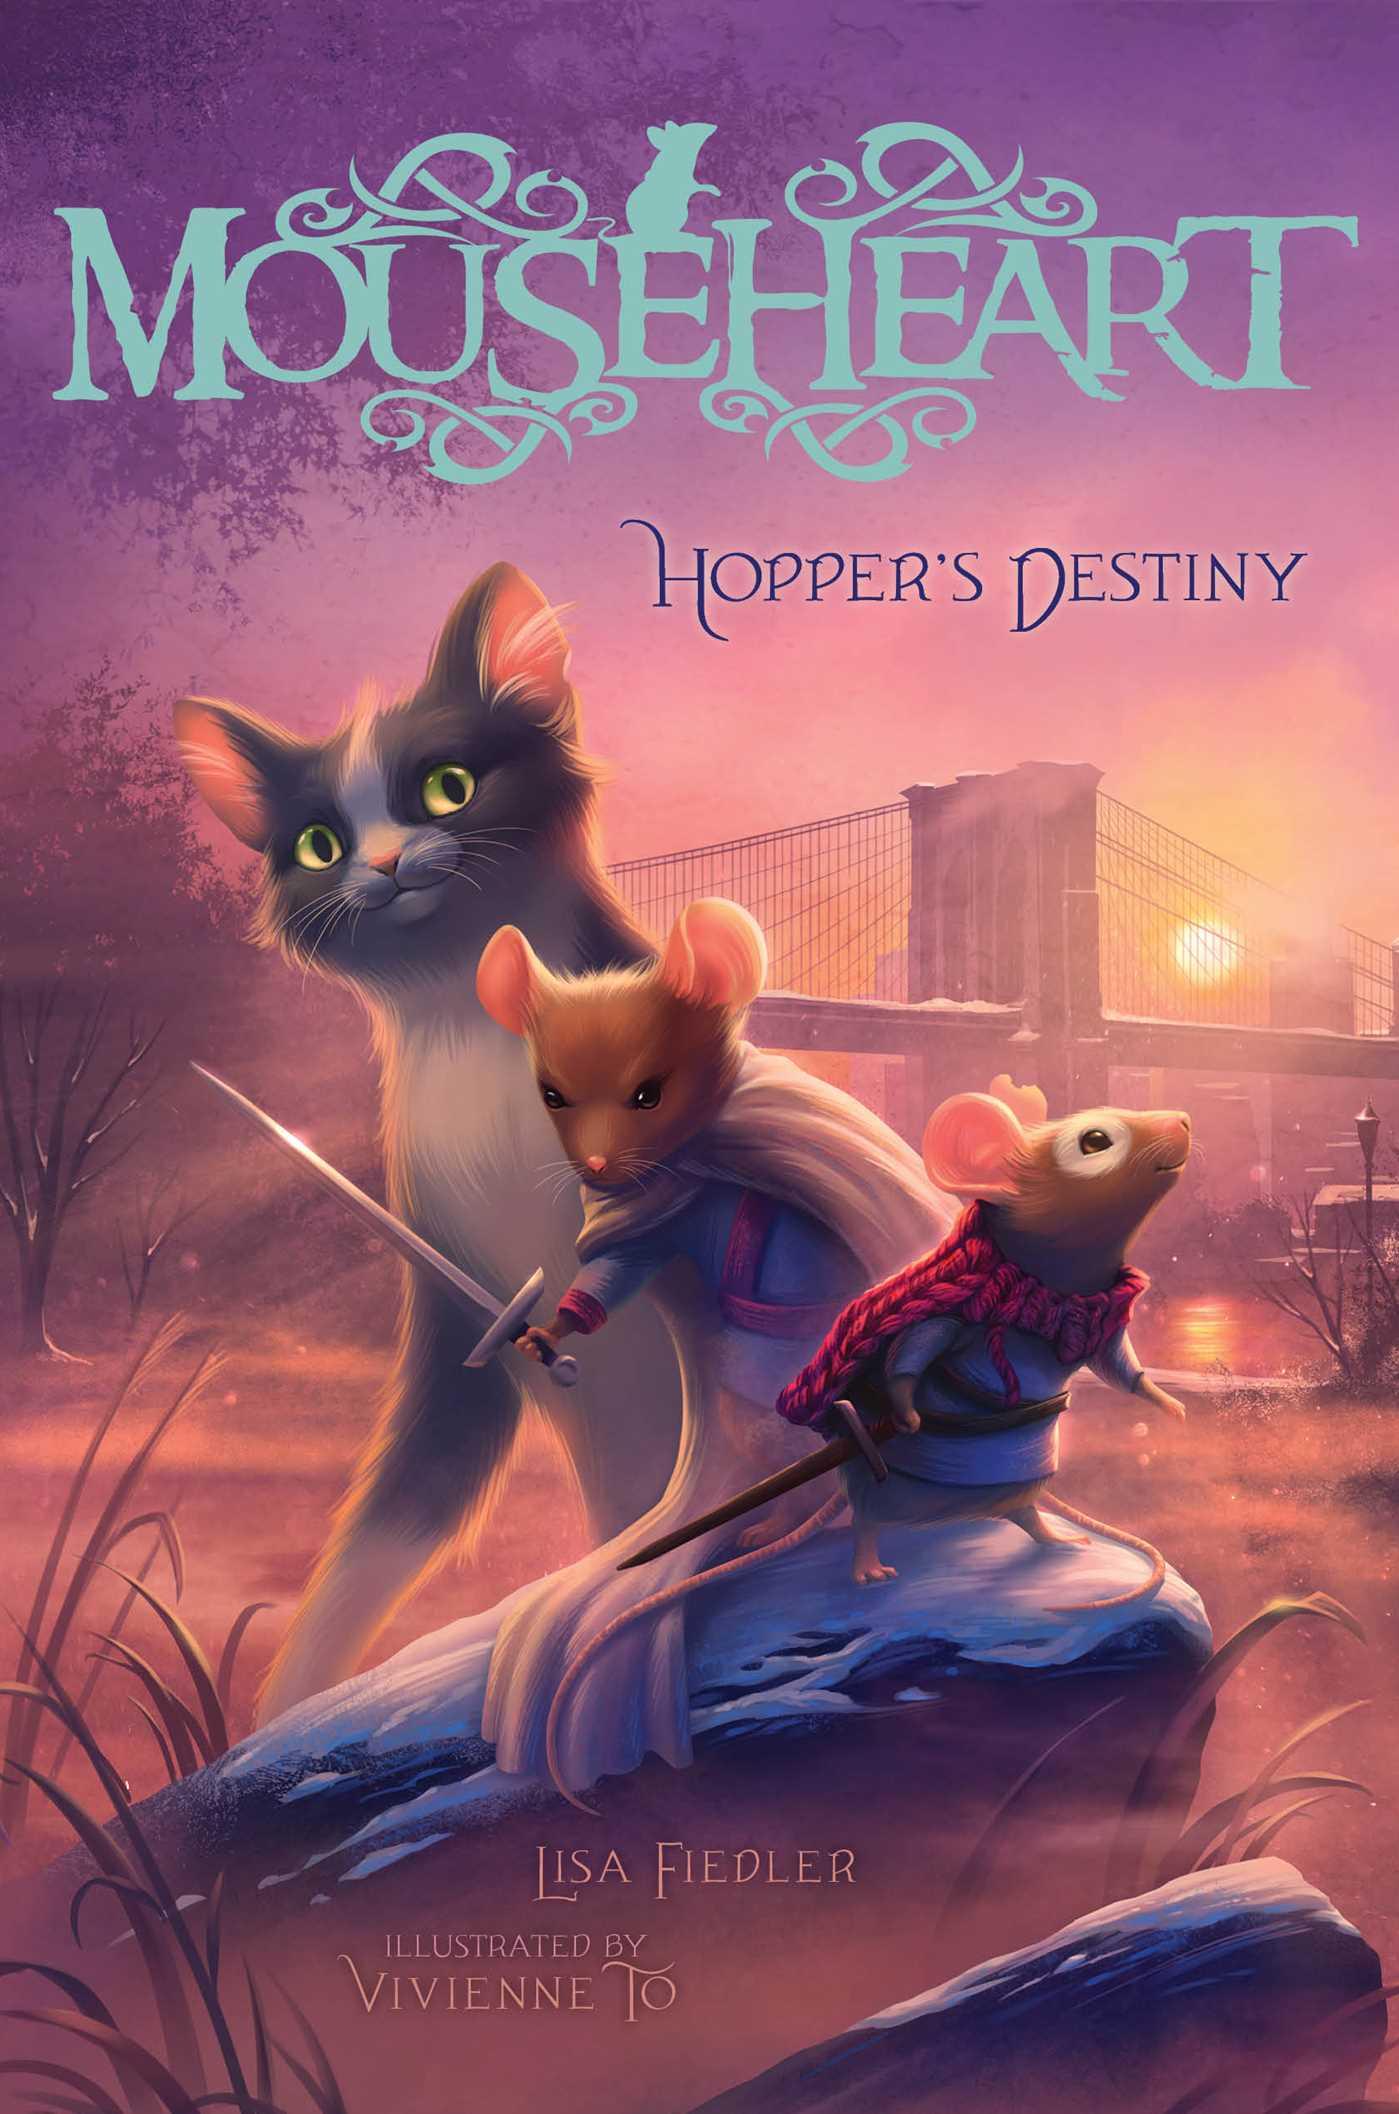 Hopper's Destiny | Book by Lisa Fiedler, Vivienne To ...